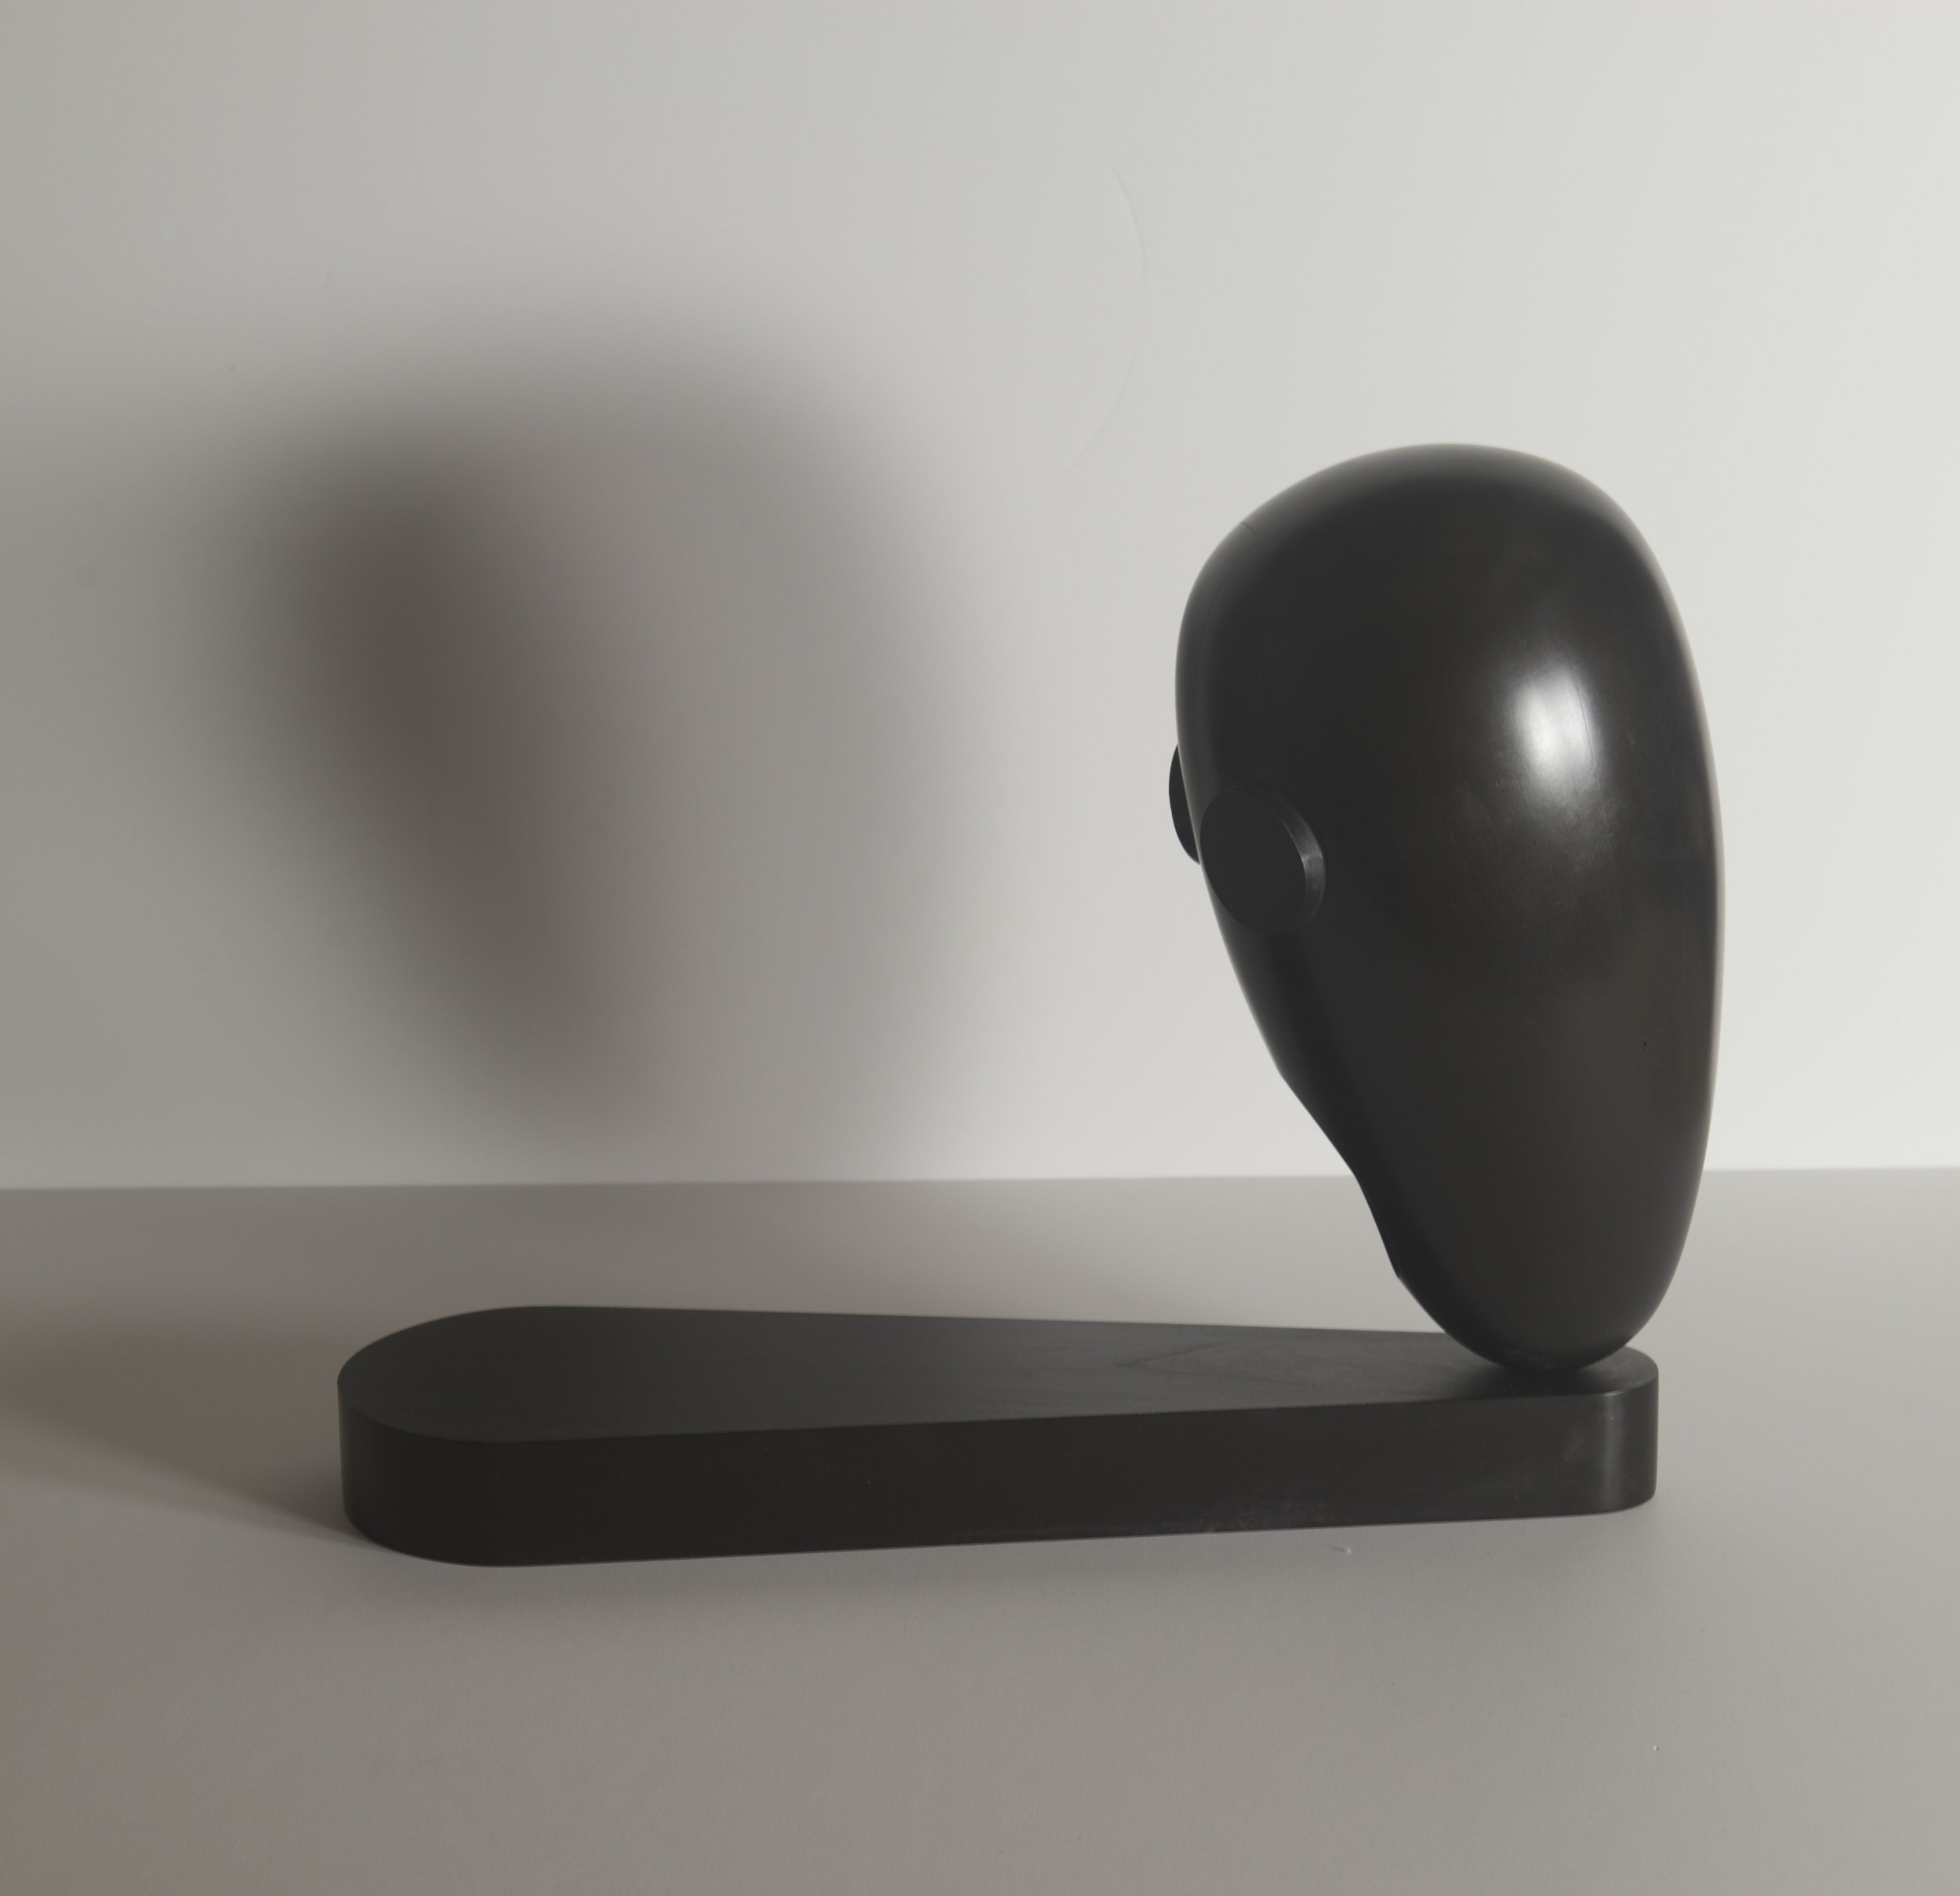 Monochrome Colletive : Gary Kret : Shadow : maple, black aniline dye paste, wax finish : 15.5 x 7.5 x 19.5 in. : $3,200.jpg